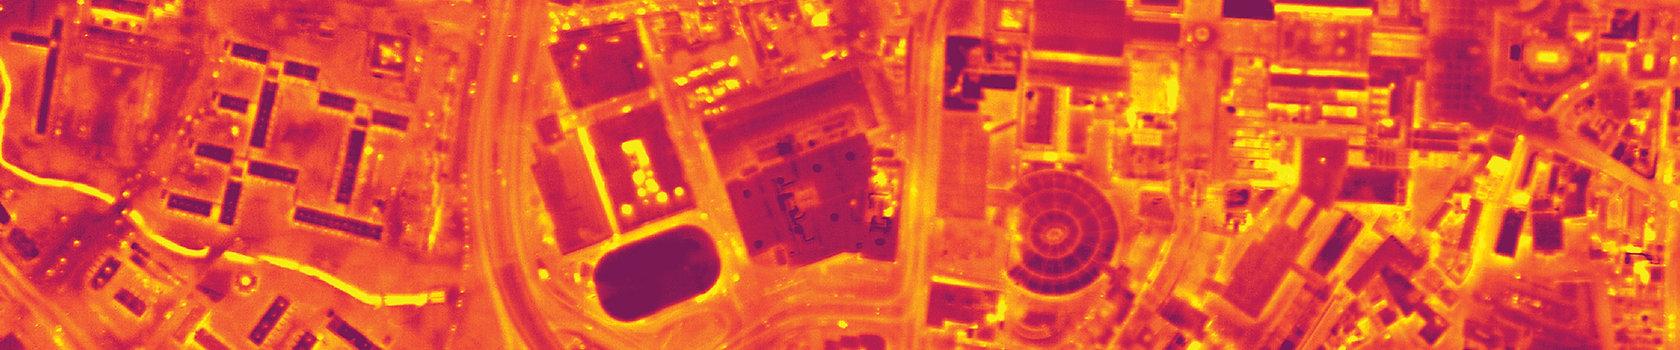 Bluesky Ireland thermal survey